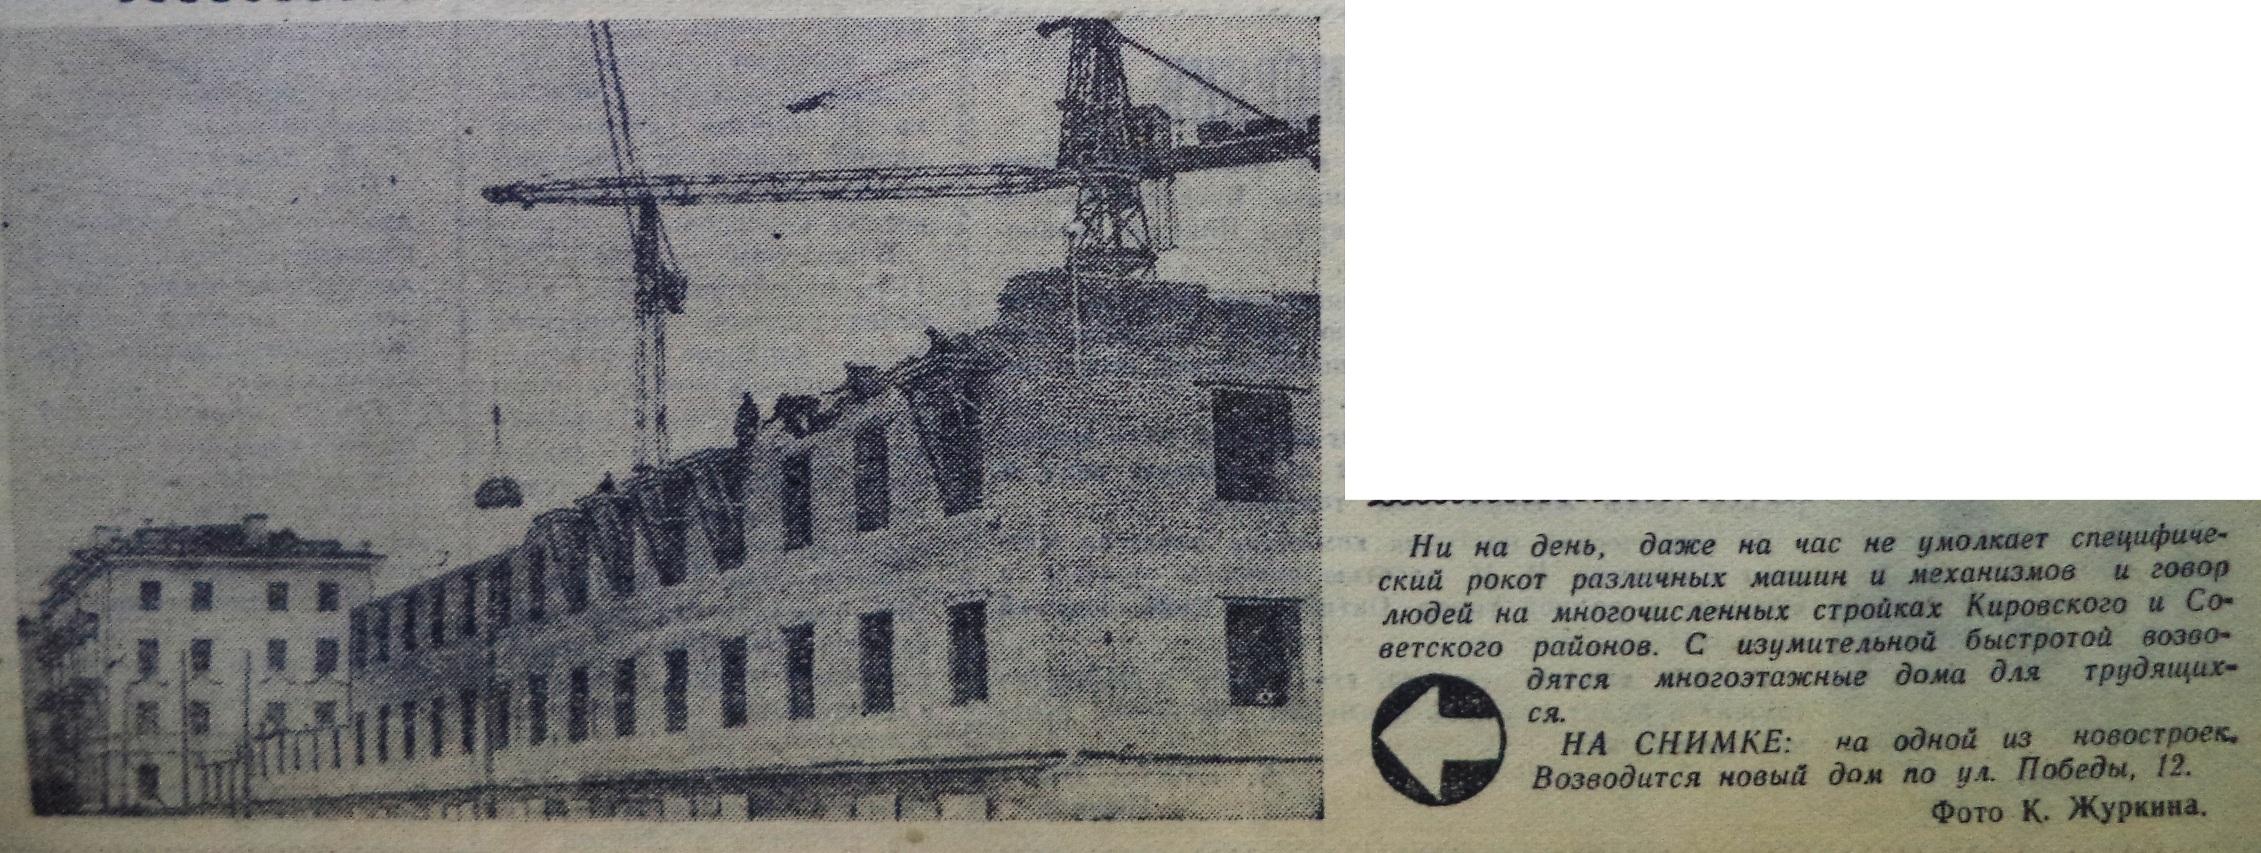 Победы-ФОТО-65-ВКц-1958-01-10-фото стр-ва по Победе-12